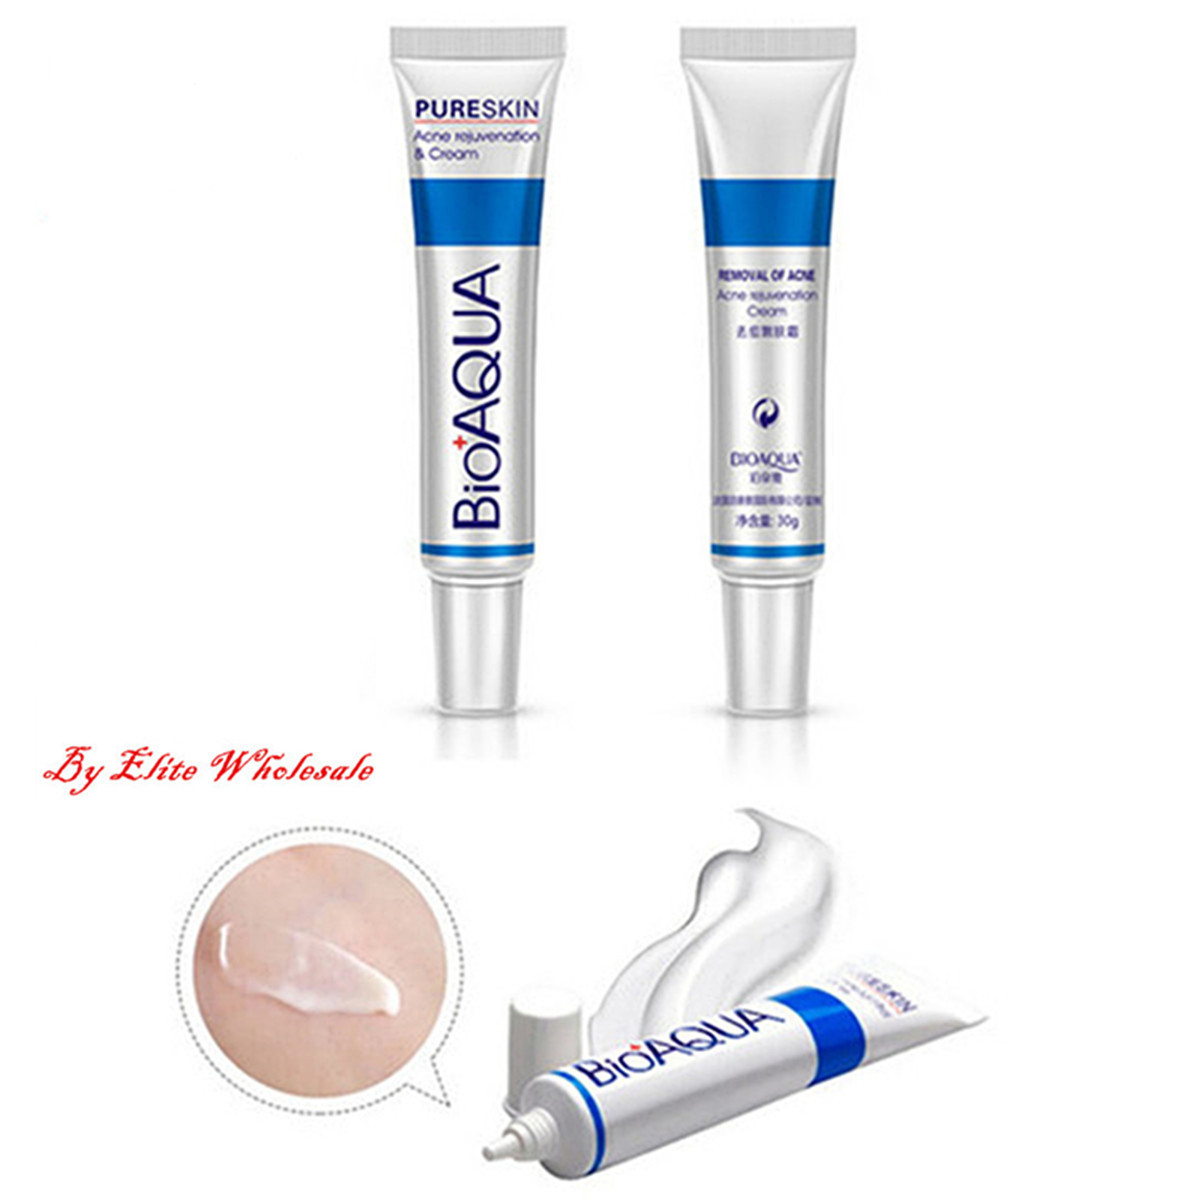 Face Care Acne Treatment Acne Scar Removal Cream